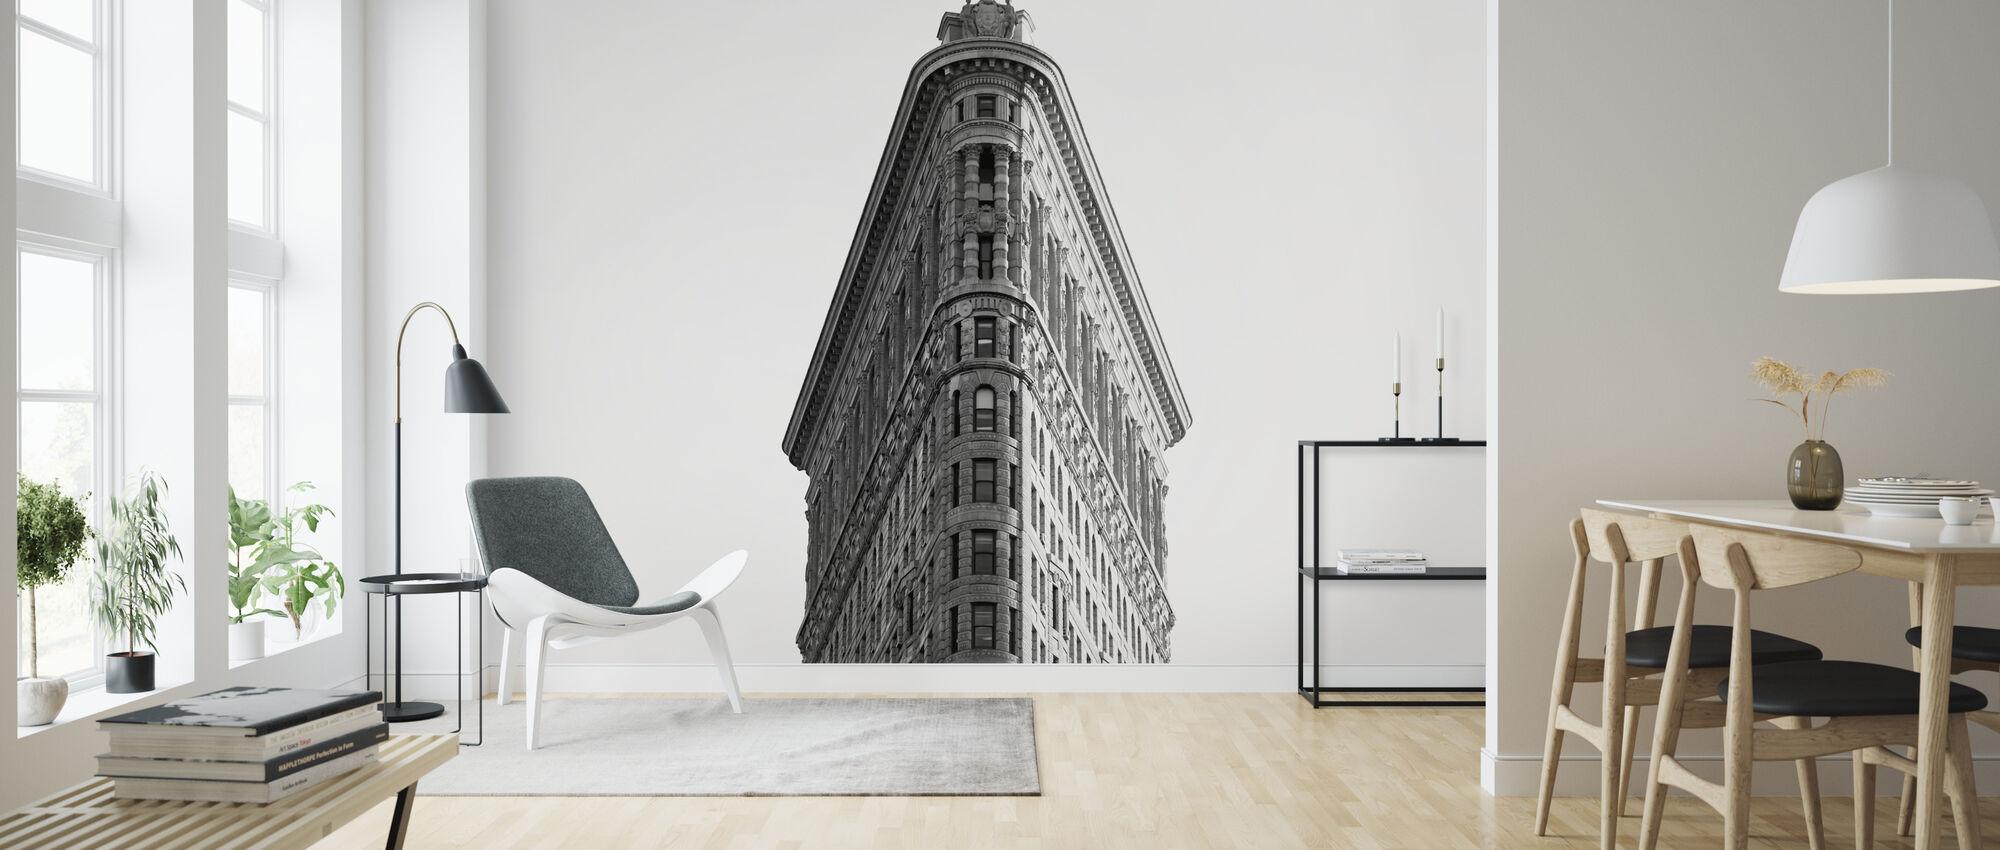 Historic Flatiron Building - Wallpaper - Living Room